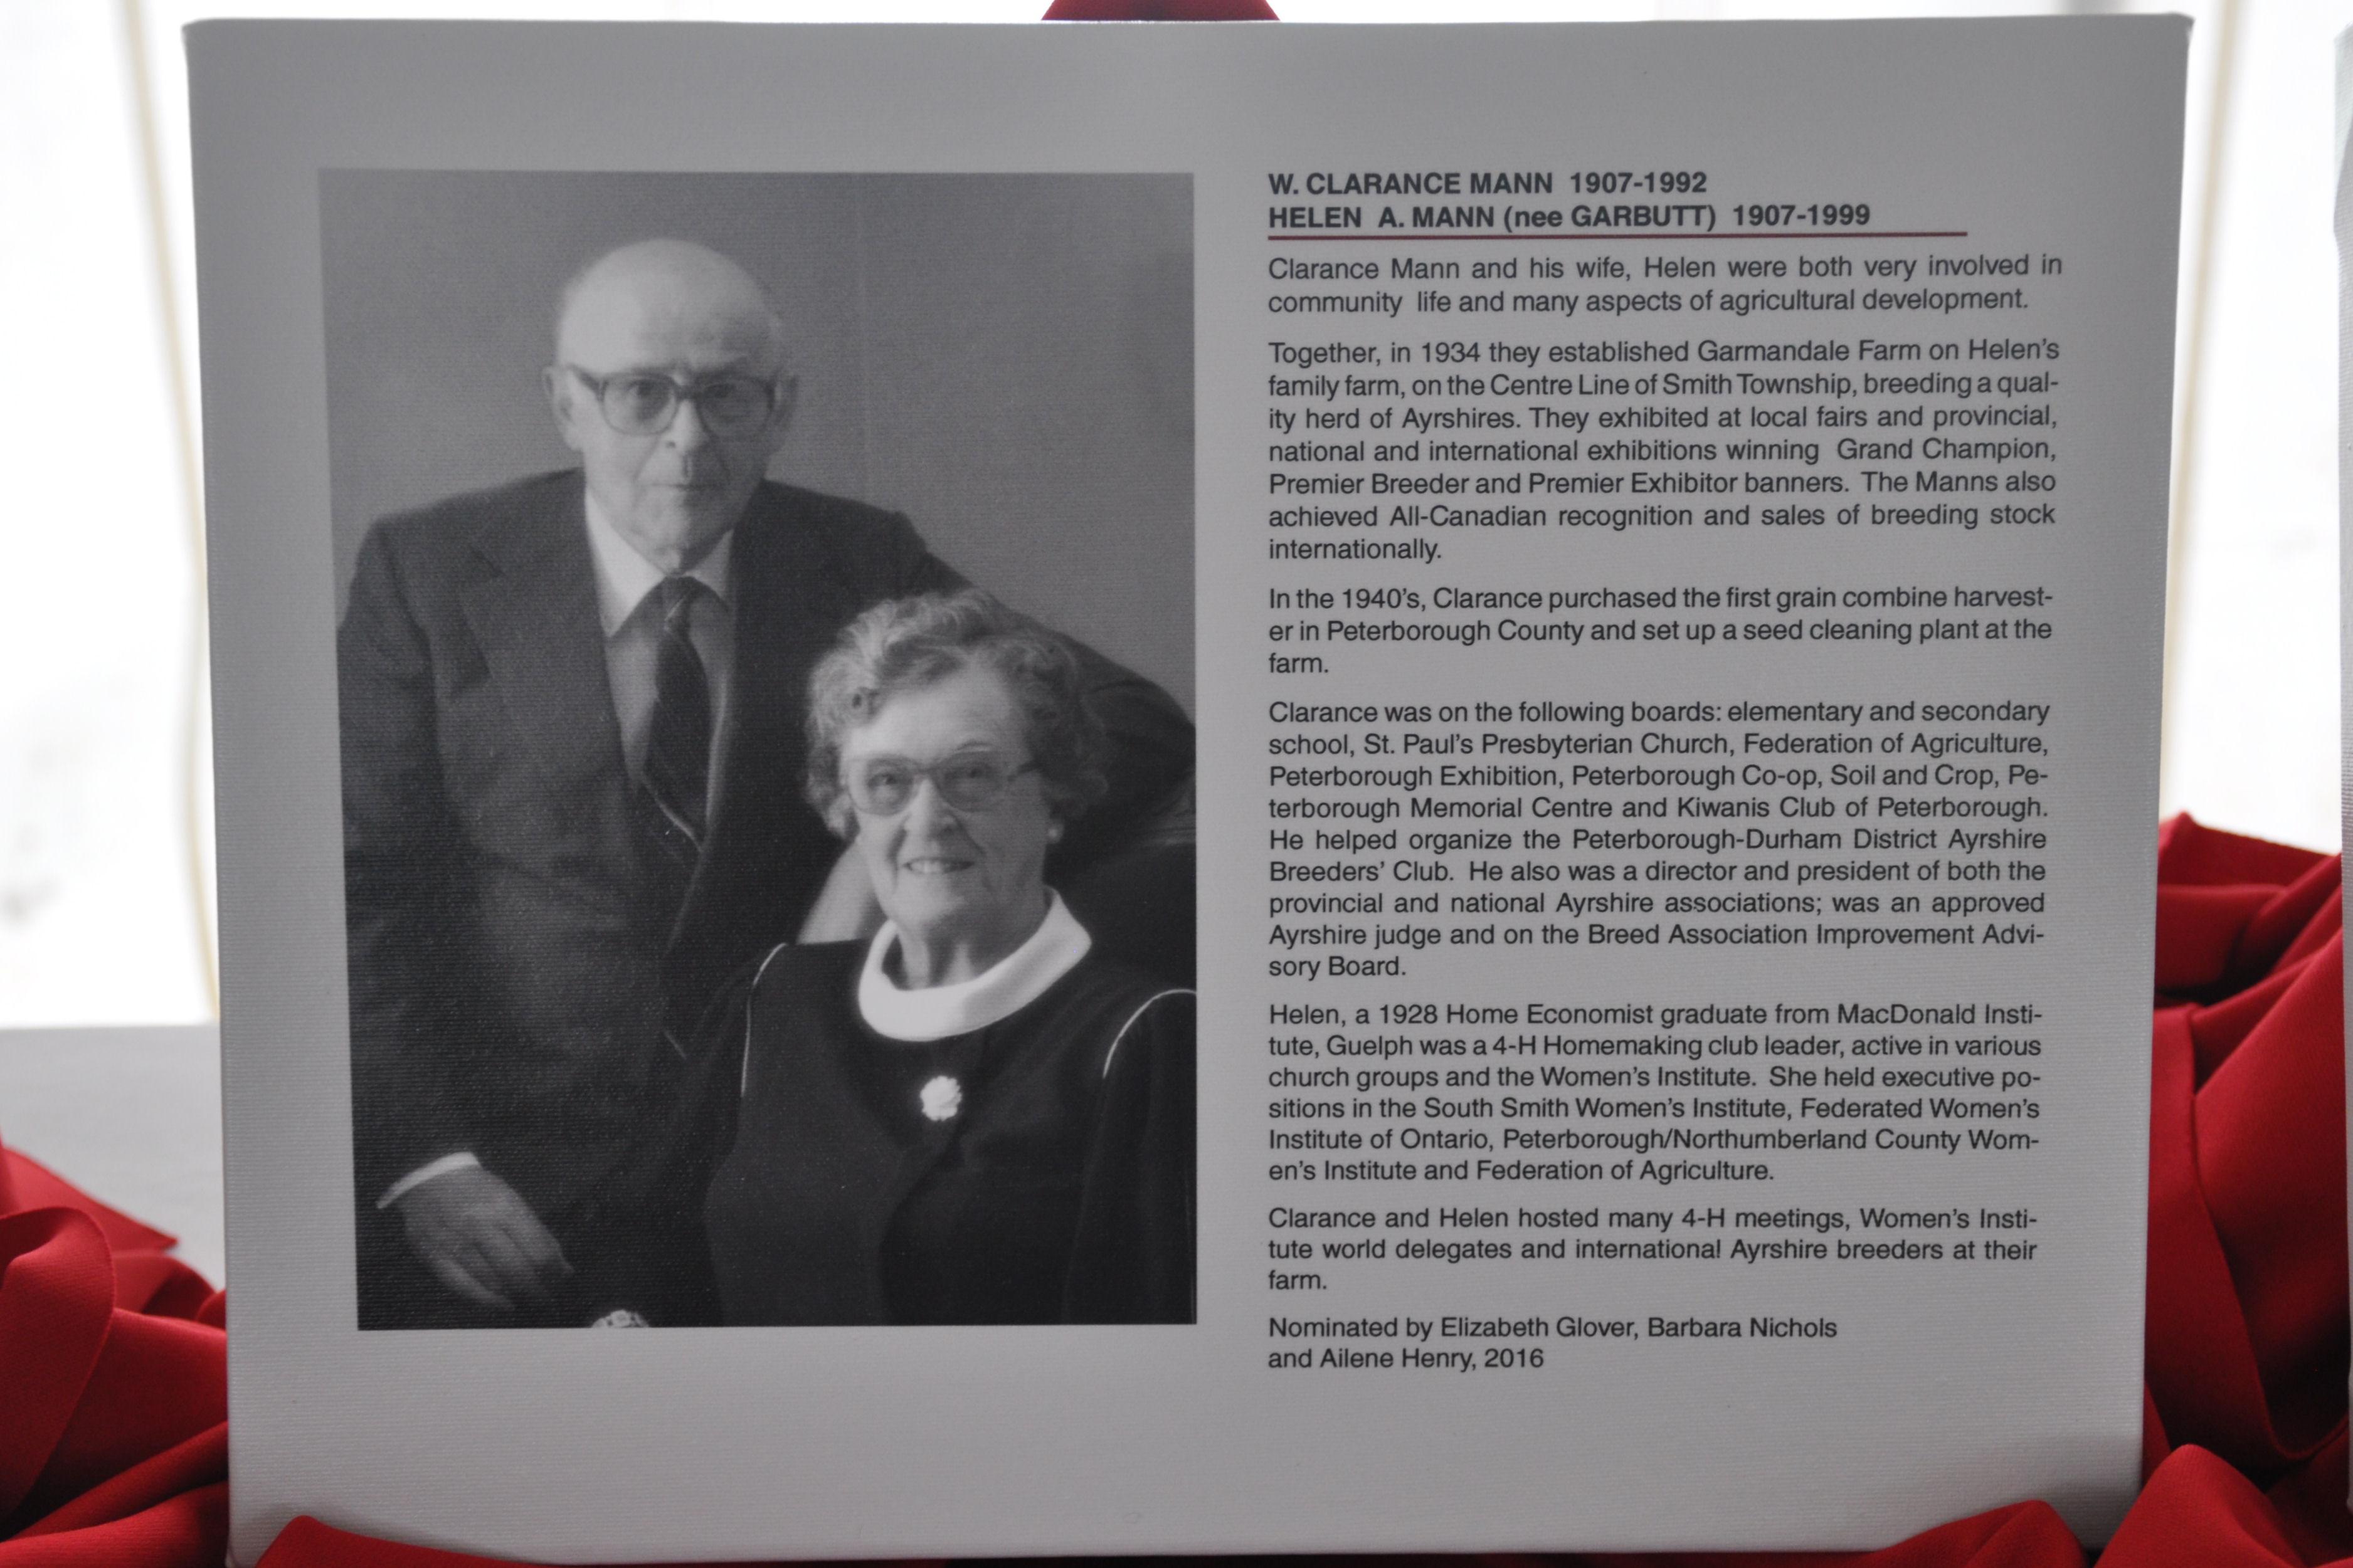 Clarance and Helen Mann